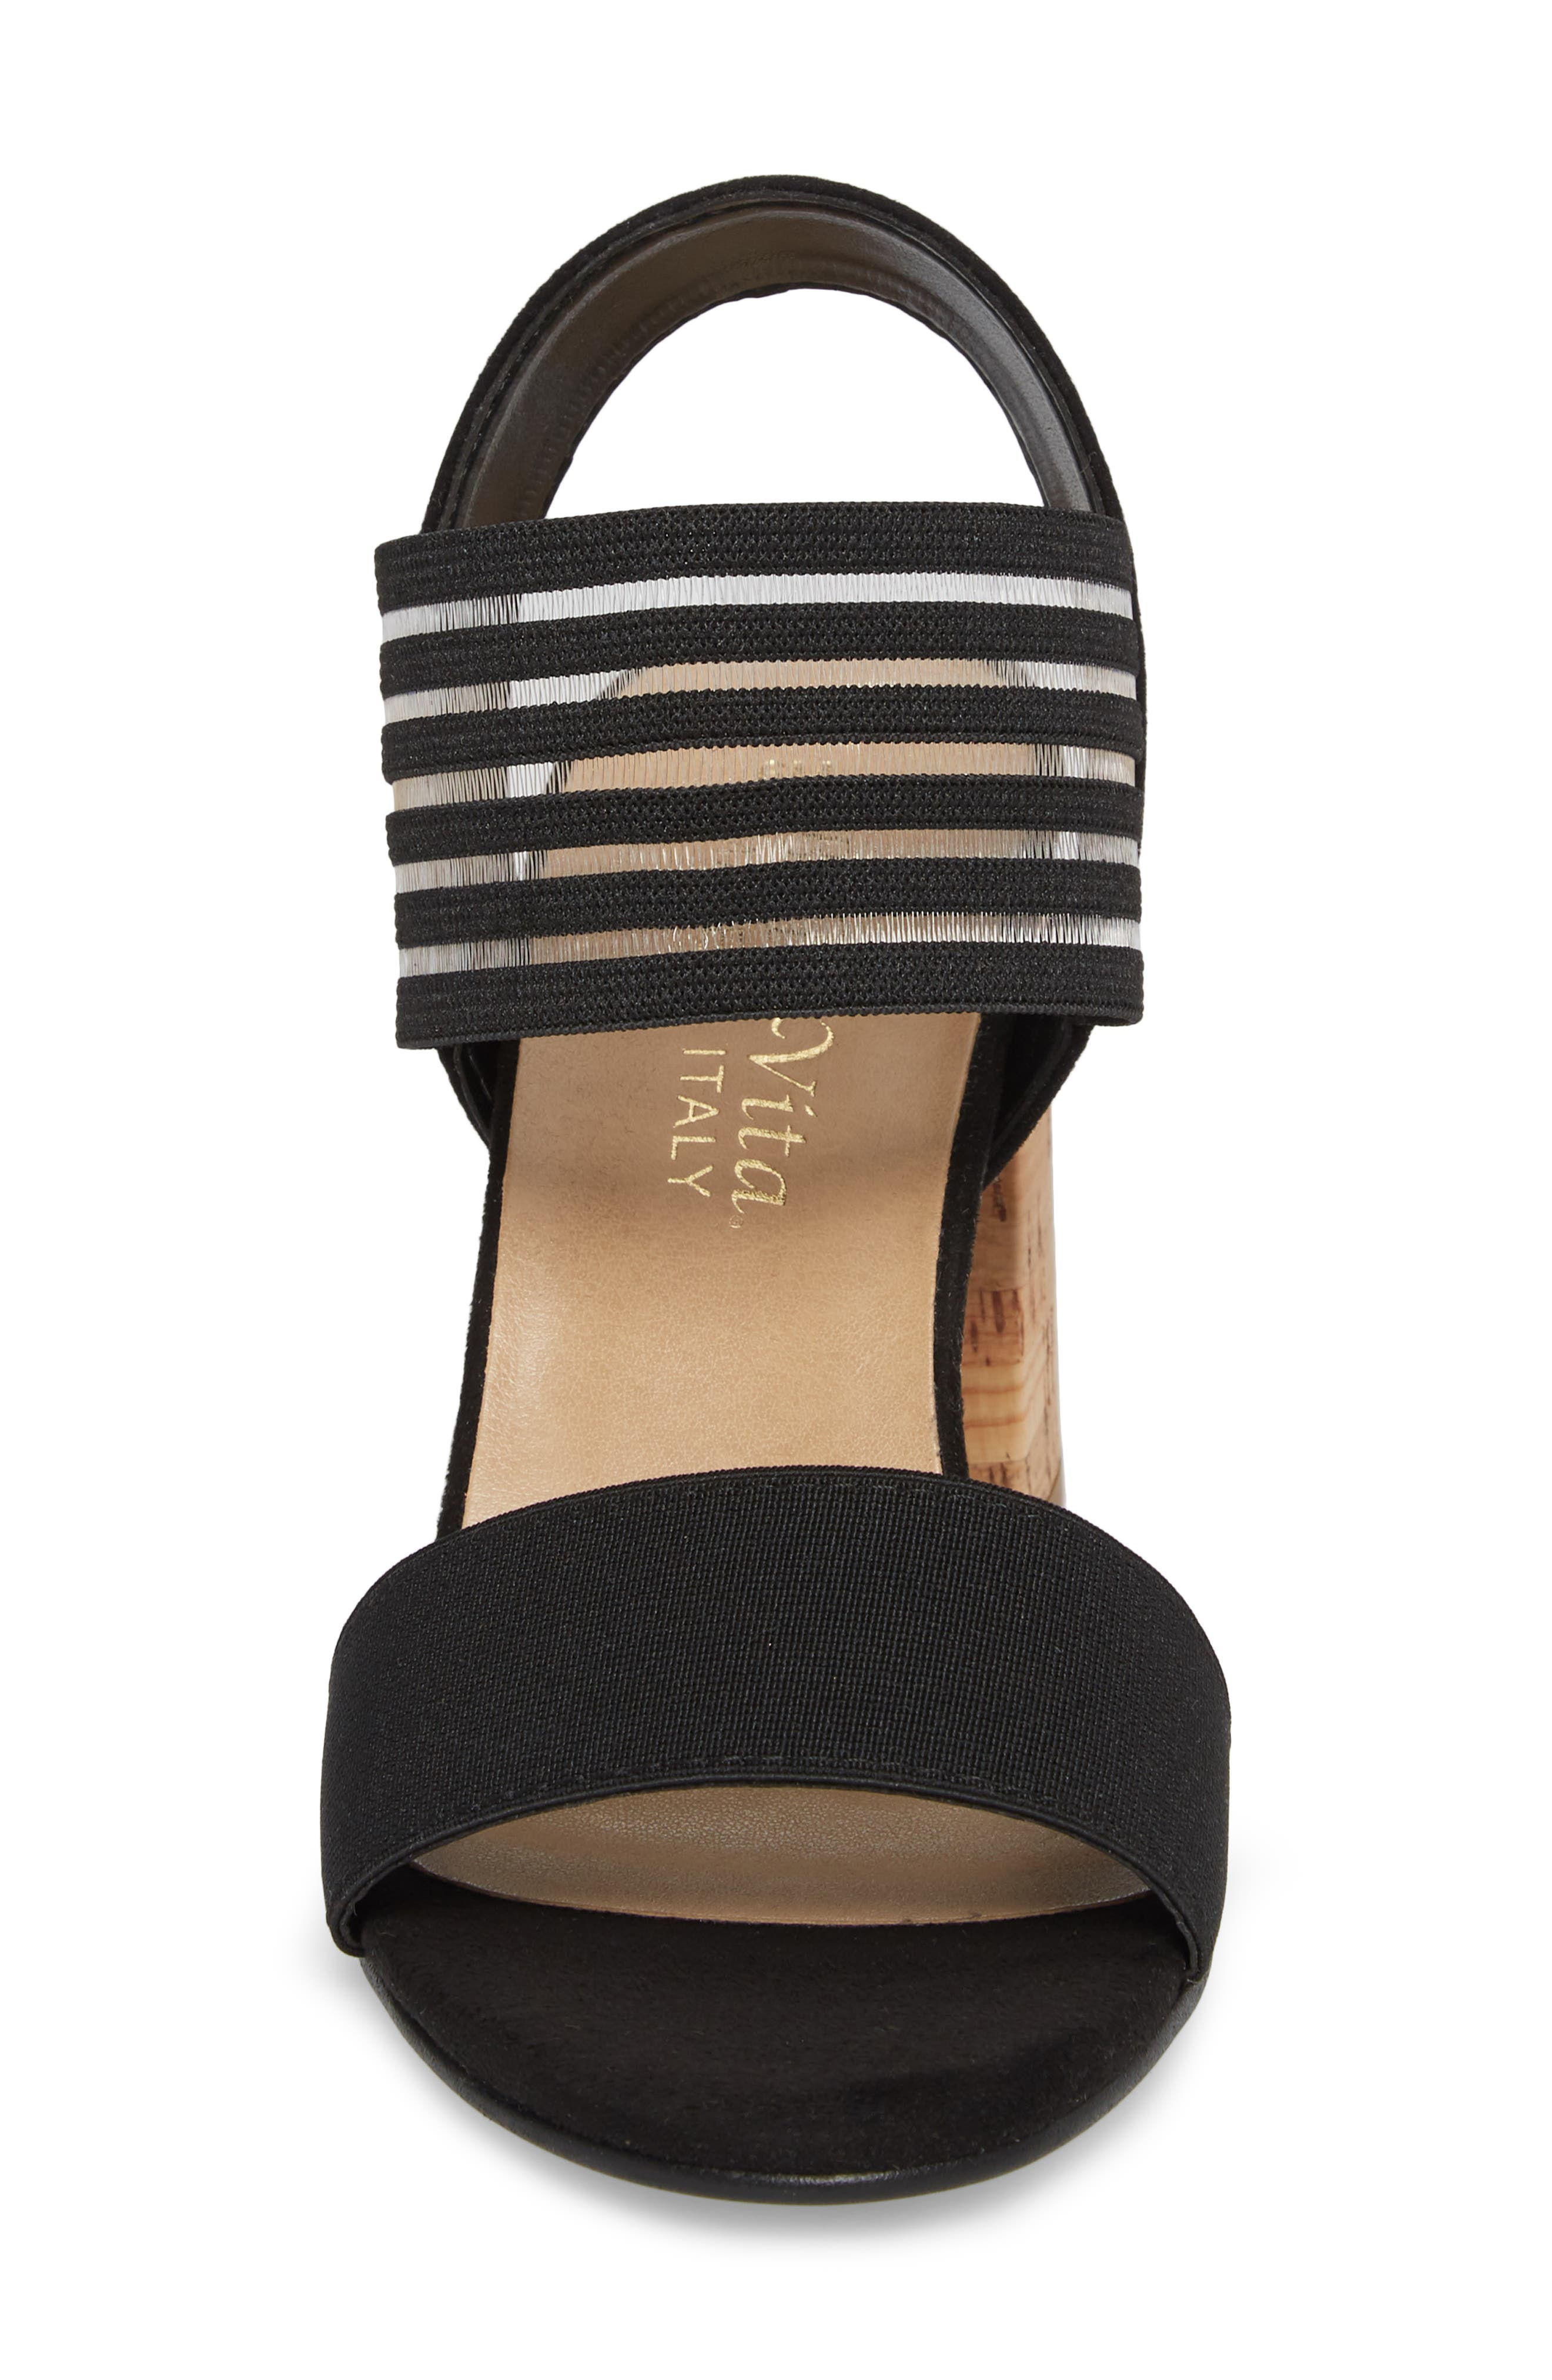 Dan Block Heel Sandal,                             Alternate thumbnail 4, color,                             Black Leather